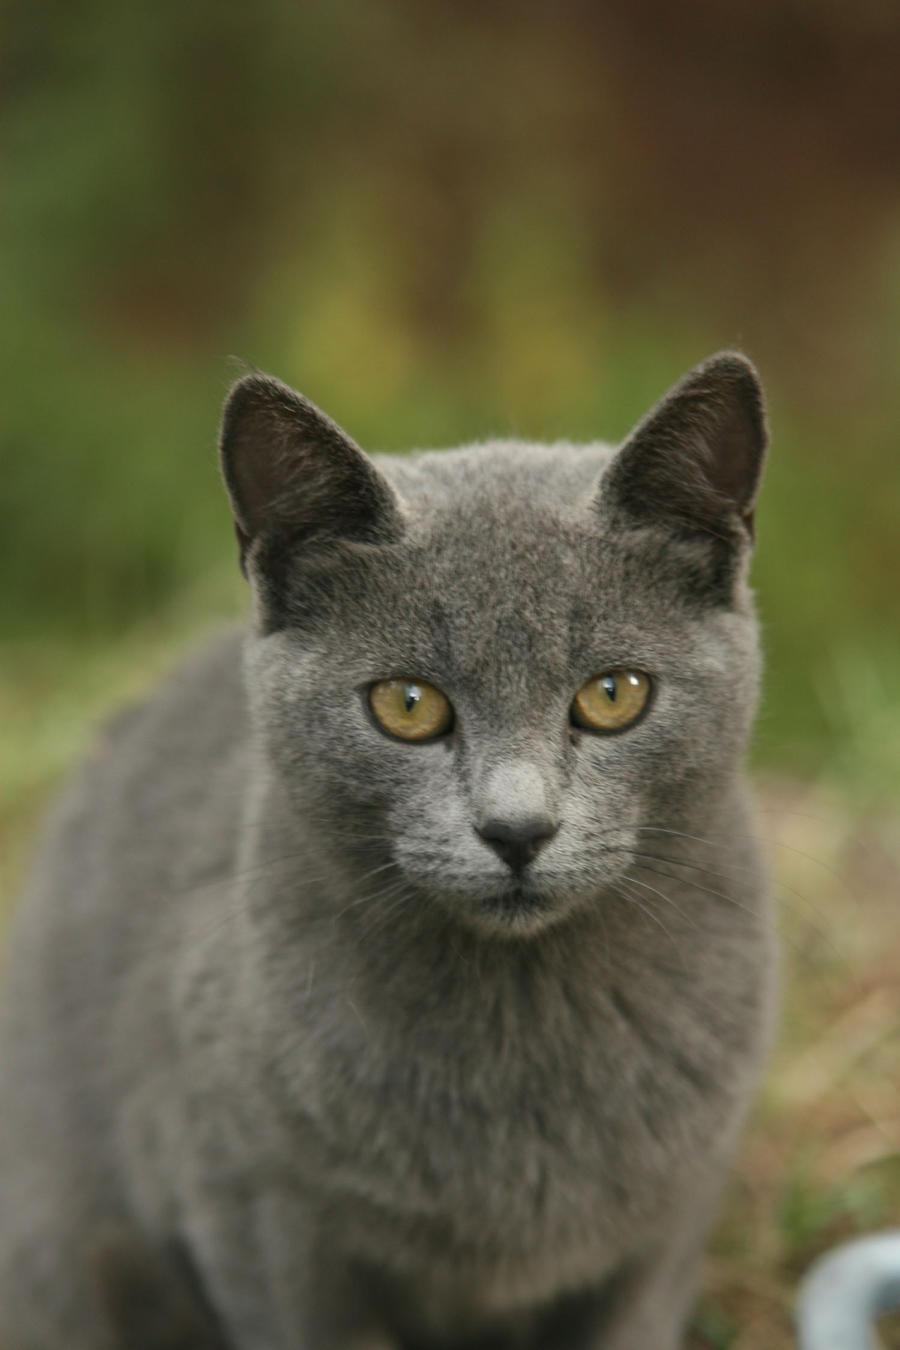 gray cat 2 by cappon on DeviantArt